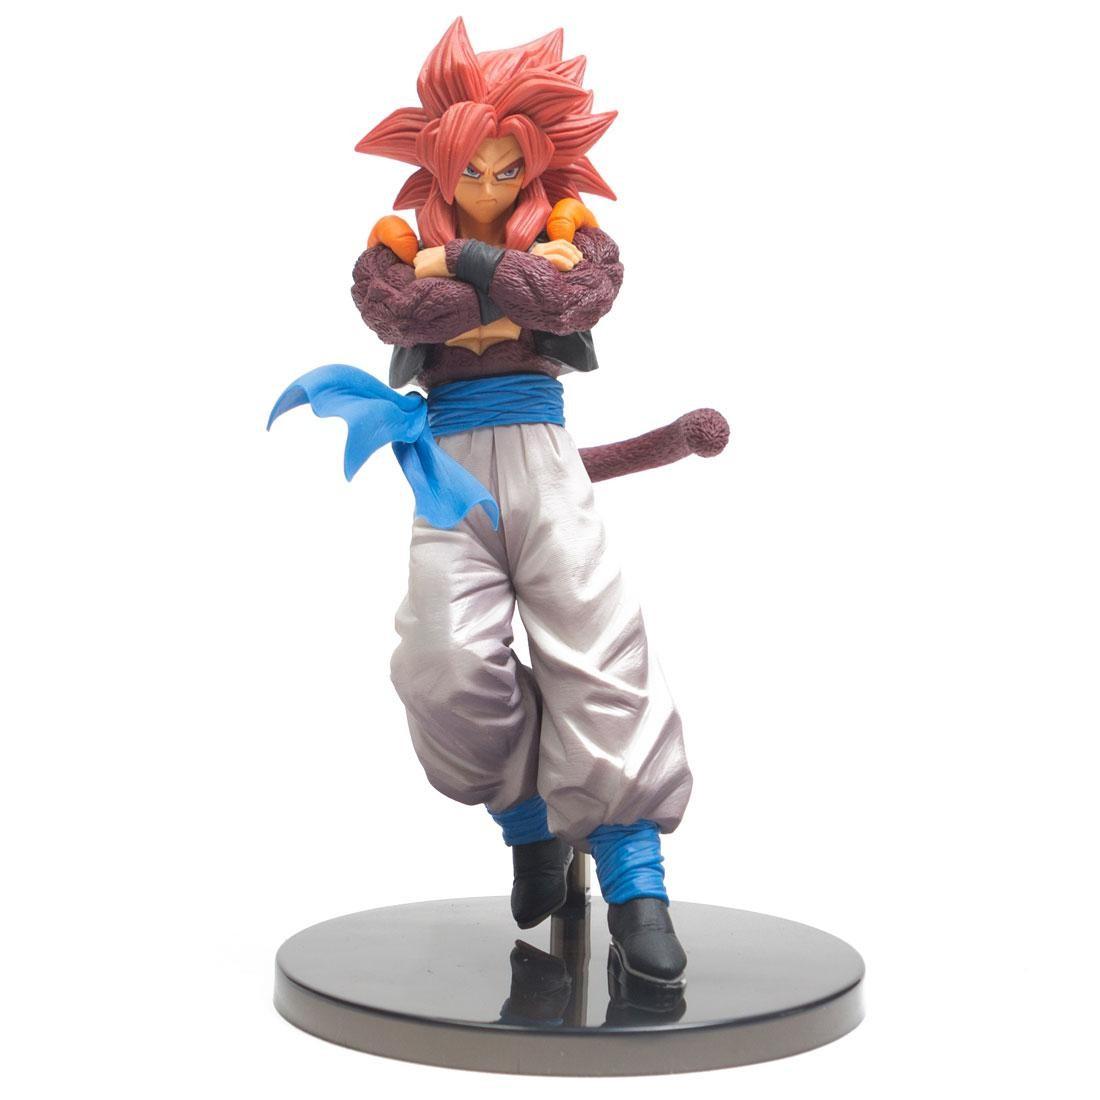 Banpresto Dragon Ball Super Goku Fes Vol 7 Super Saiyan 4 Gogeta Figure Red